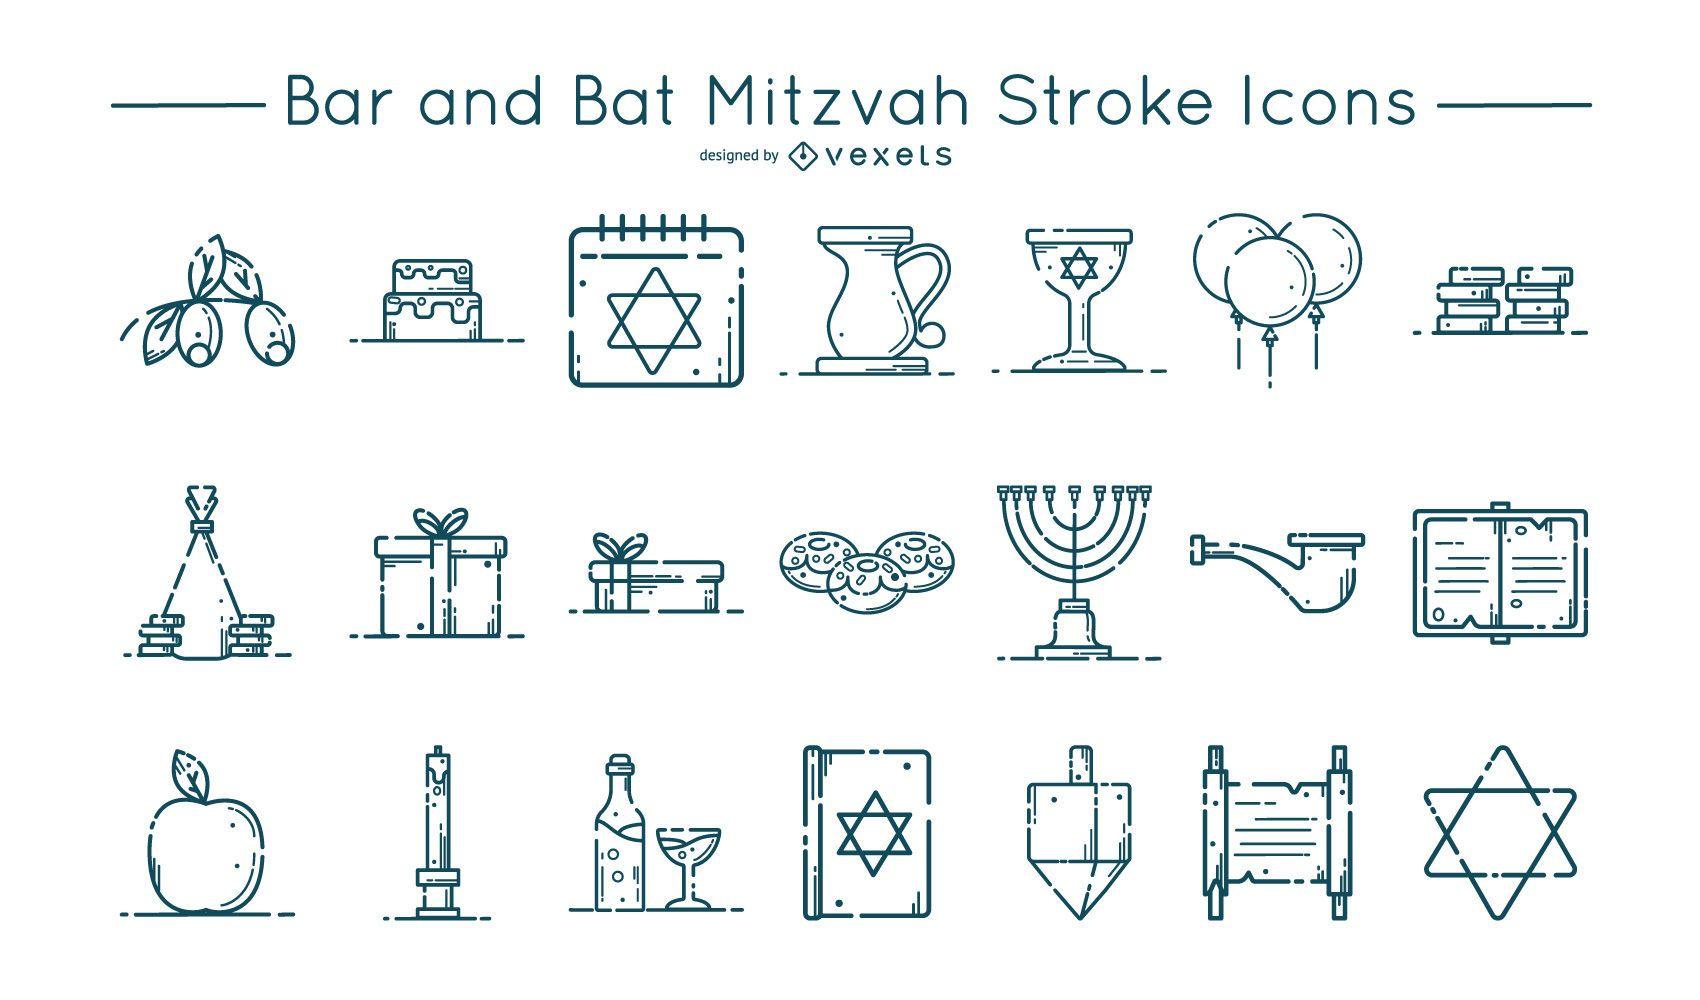 Bar and Bat Mitzvah Stroke Icon Set